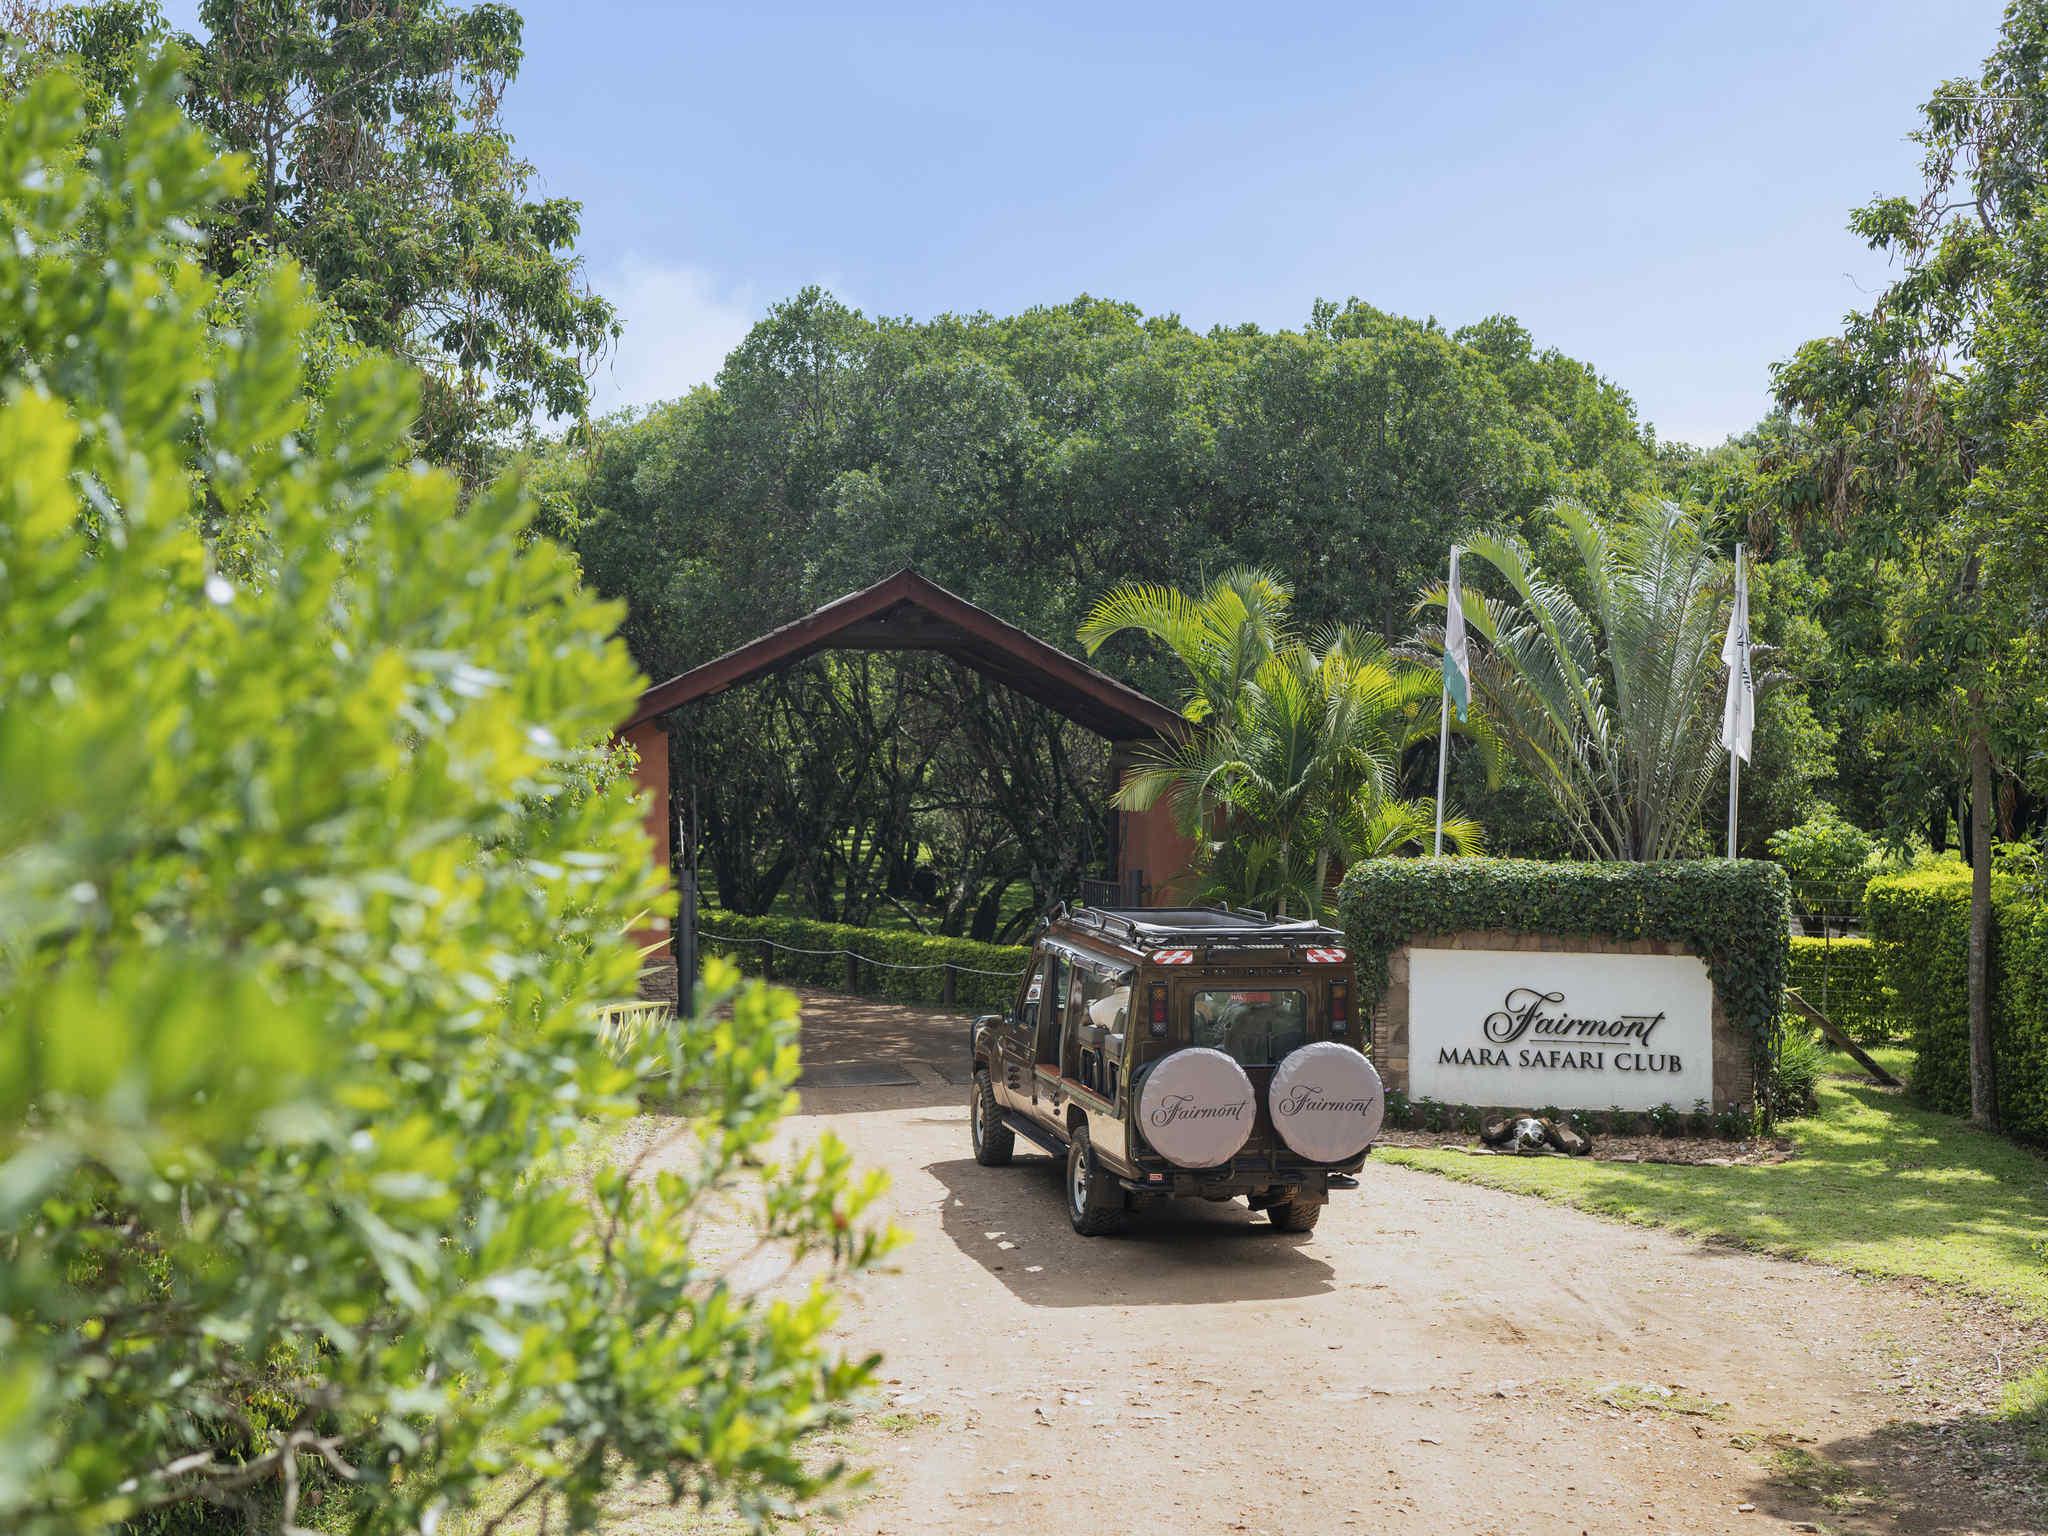 Hotel – Fairmont Mara Safari Club